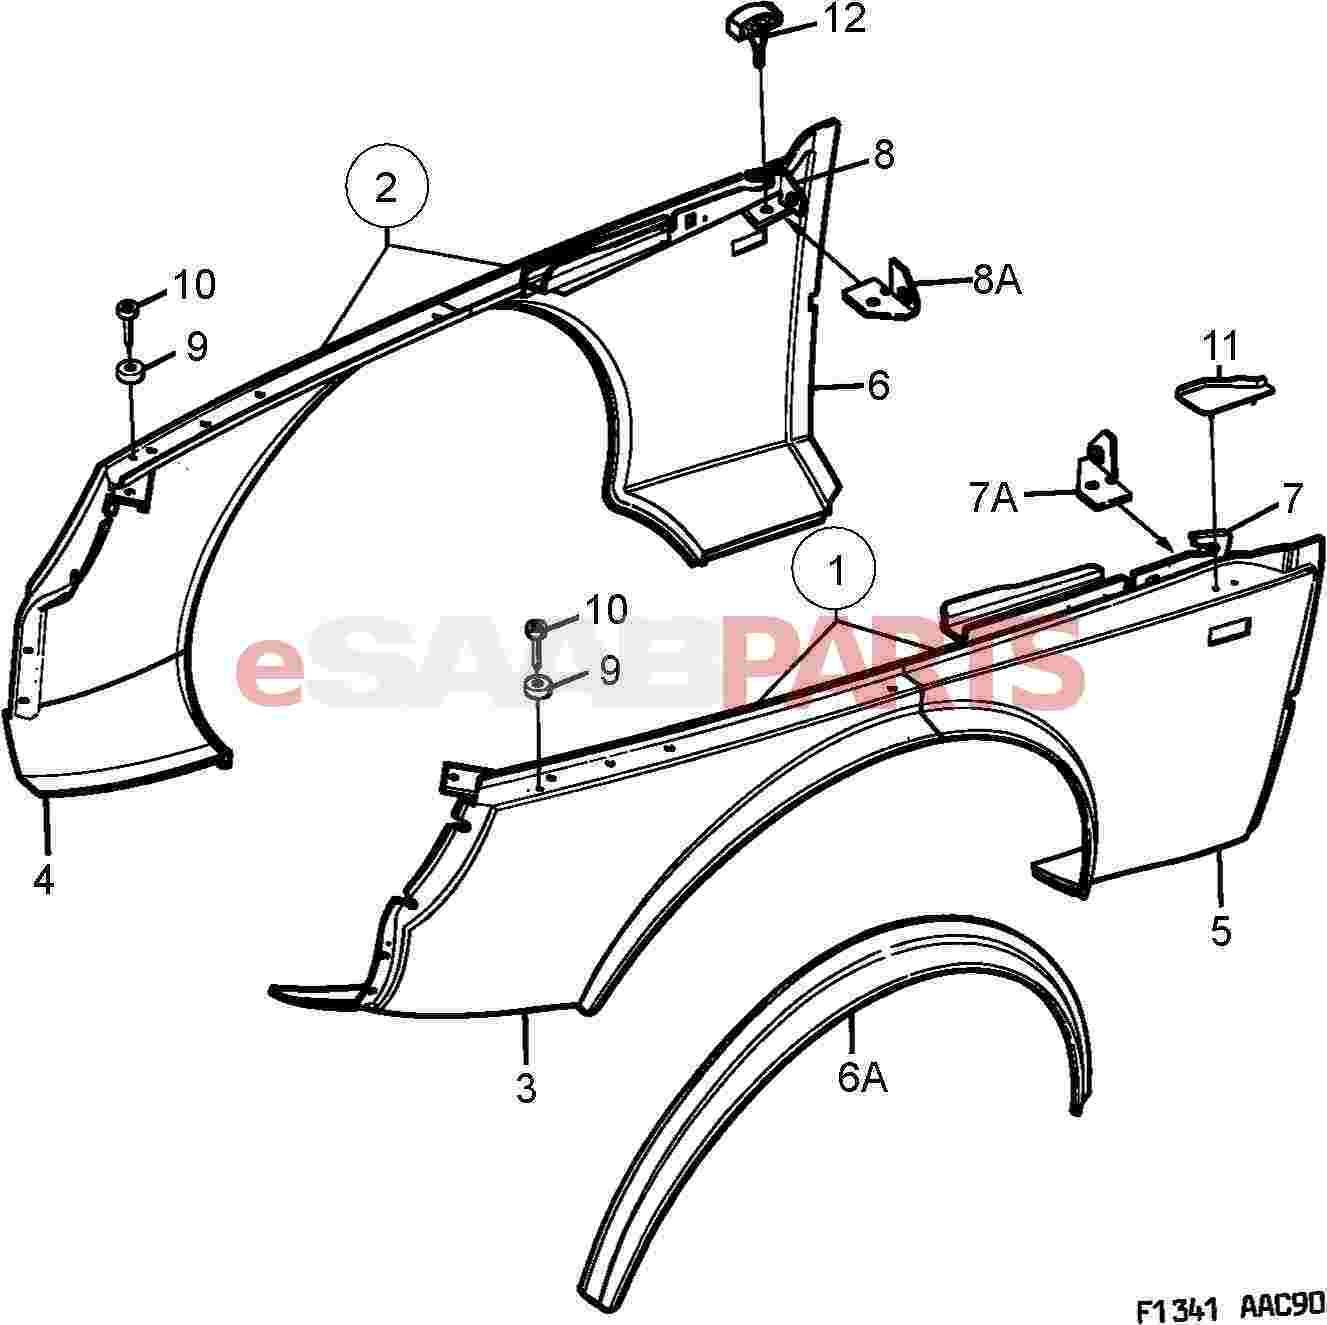 Car body parts diagram within acura mdx radio wiring diagram yamaha